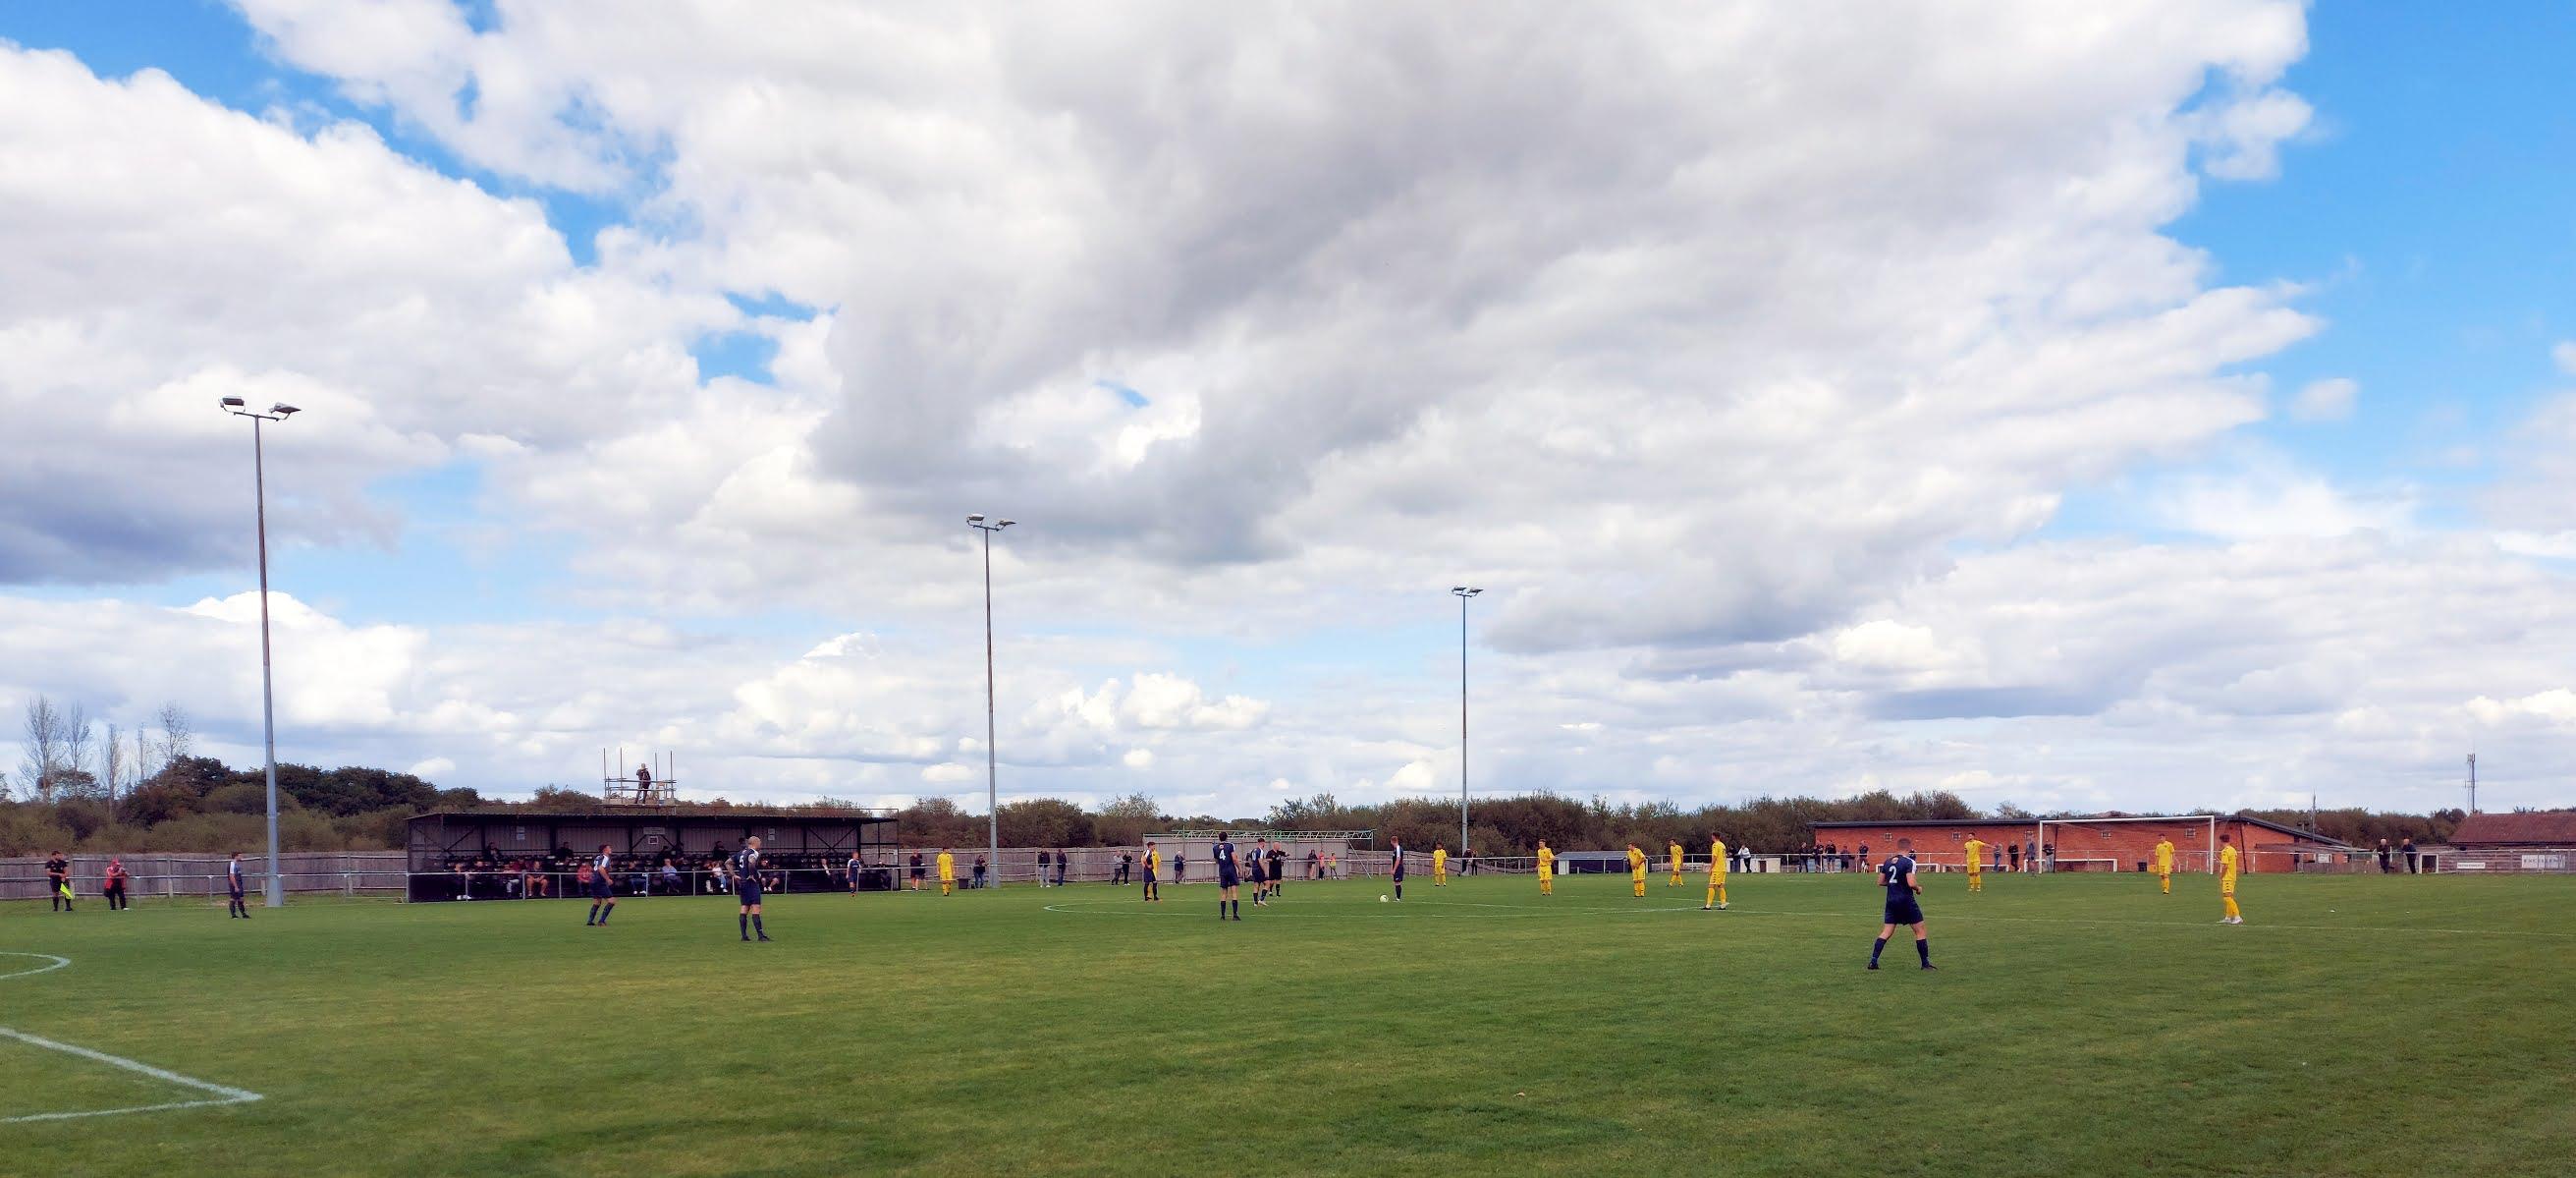 Tadley Calleva and Hamble Club players await kick off.